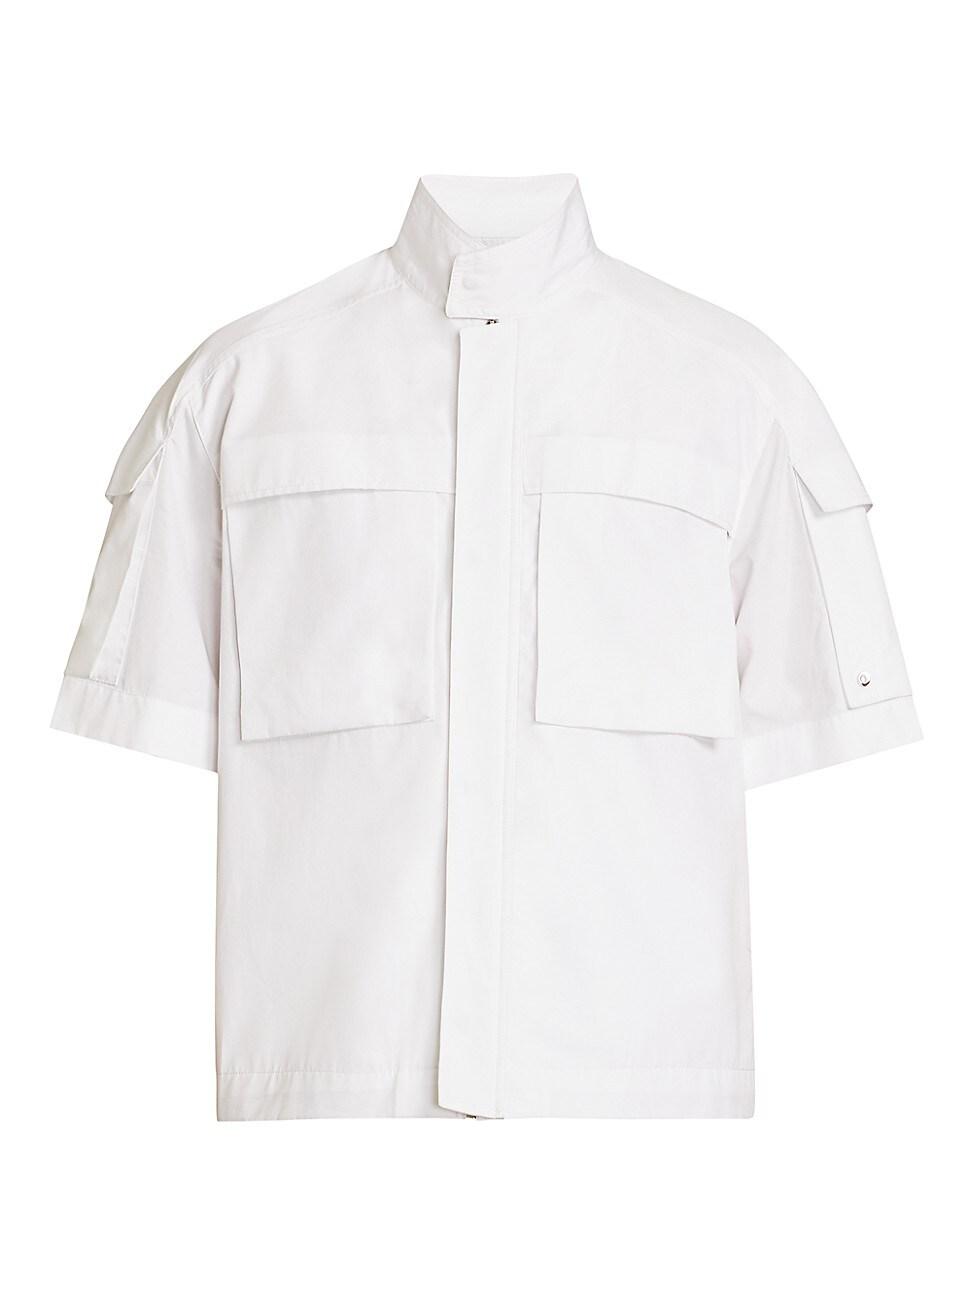 Givenchy Cottons MEN'S WORKWEAR SNAP & ZIP POCKET SHIRT